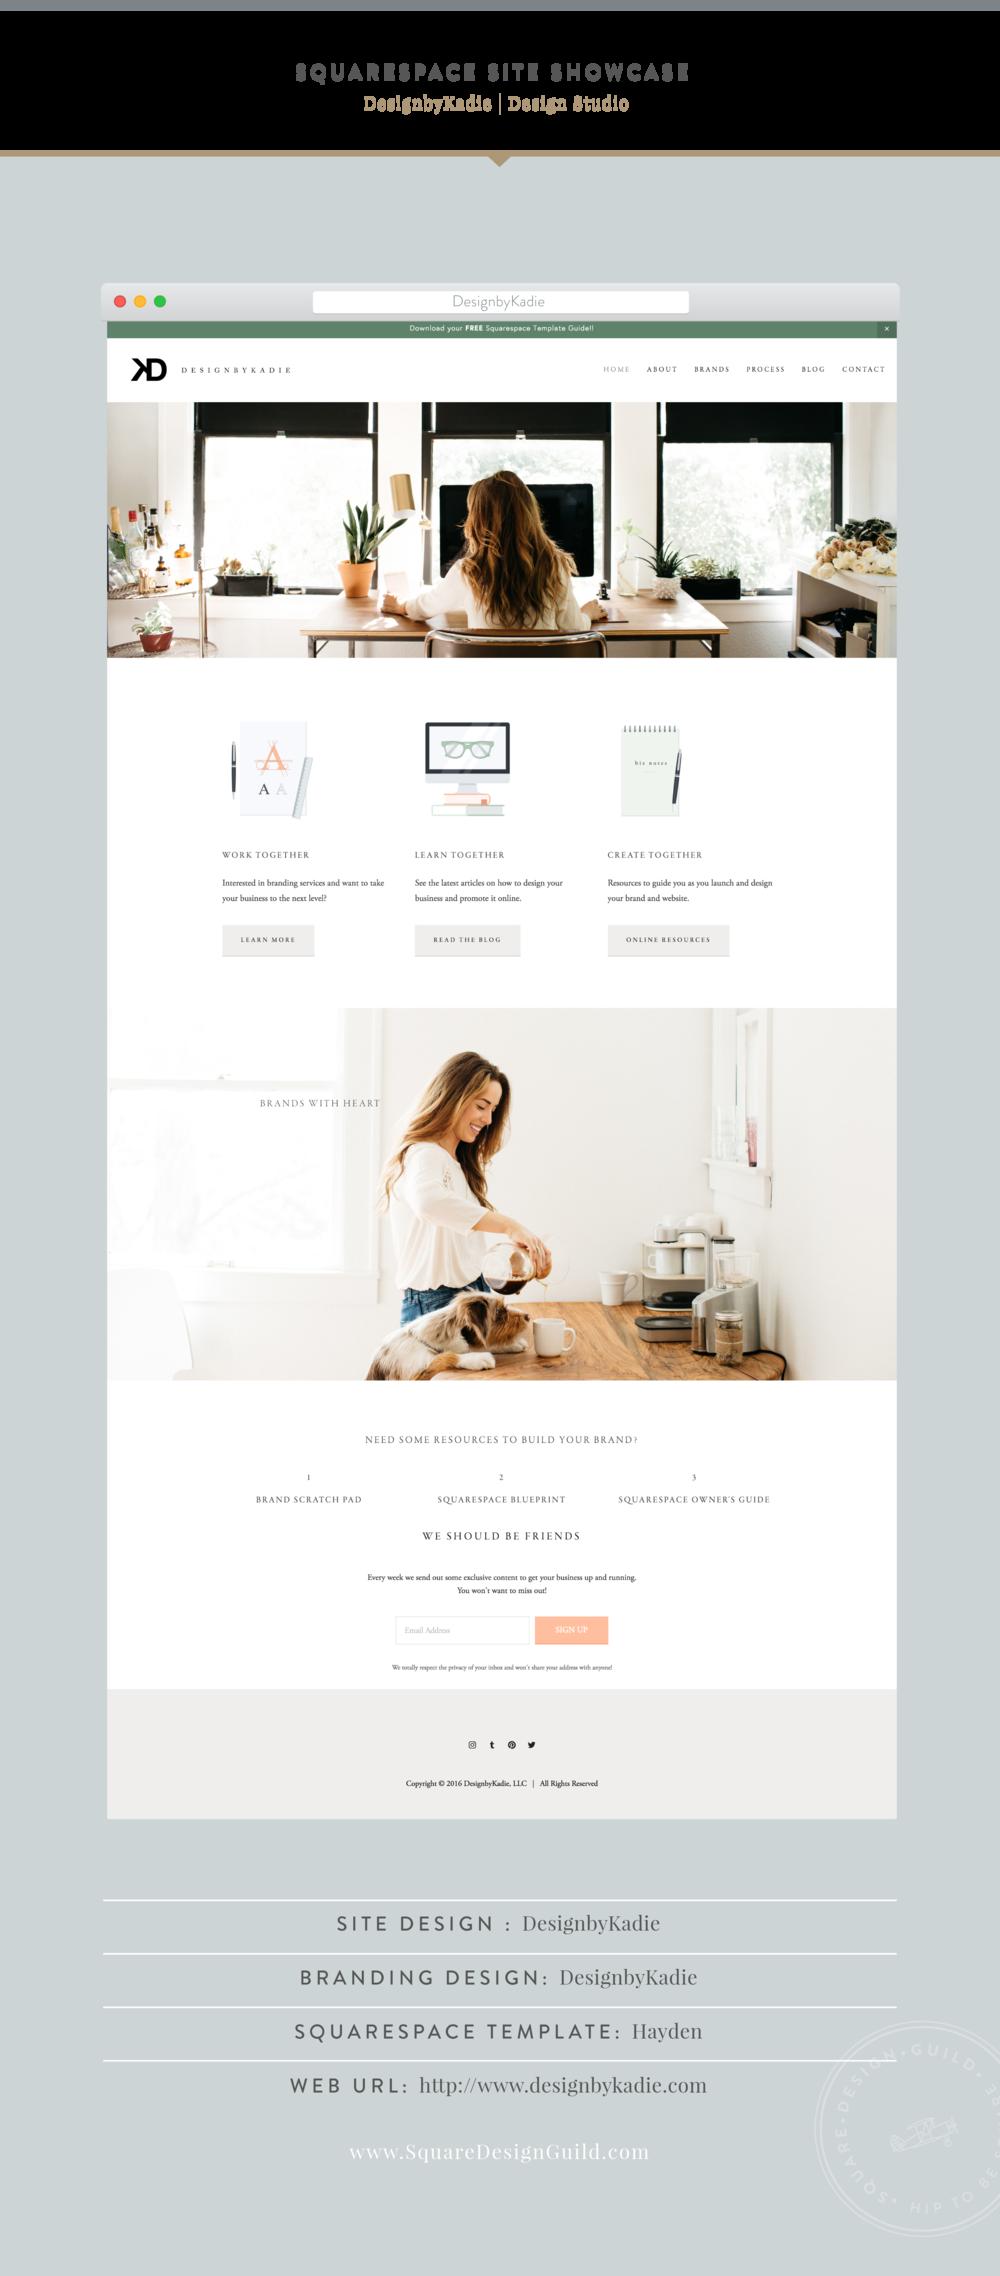 Squarespace Design Guild | Site Showcase - DesignbyKadie Boutique Graphic Design Studio in Dallas TX